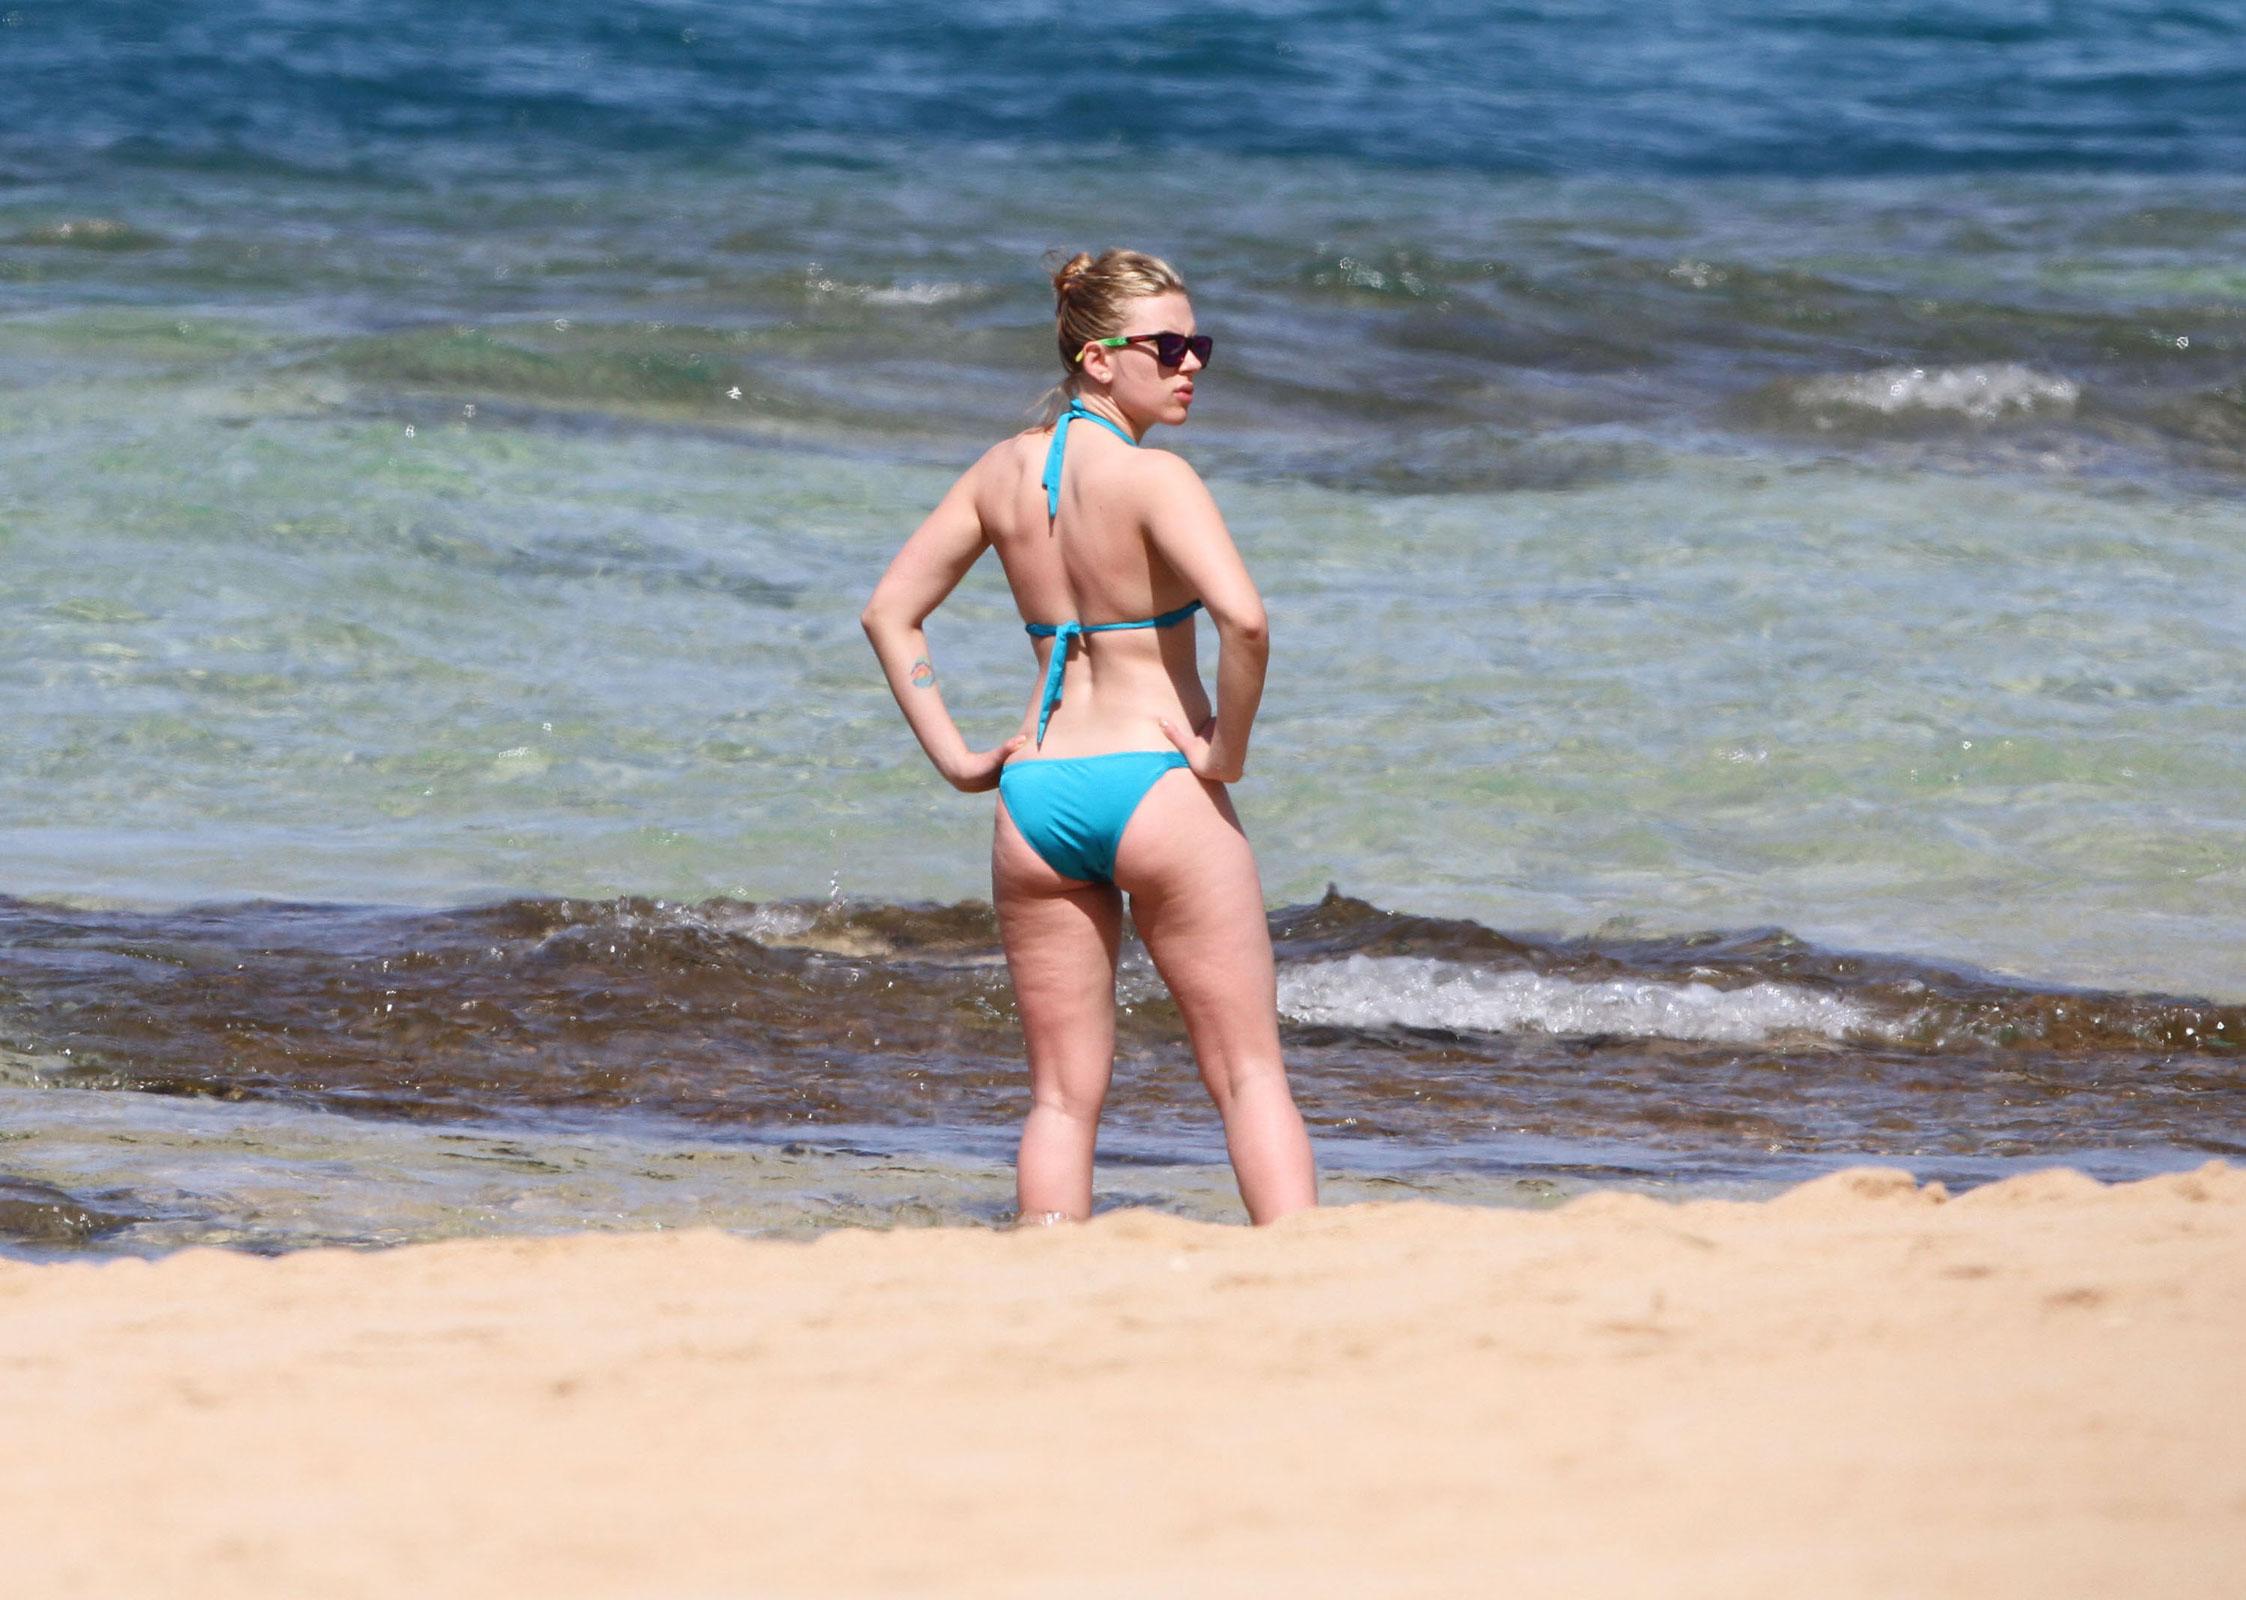 ec83ced5956 Scarlett Johansson in Bikini at a Beach in Hawaii – HawtCelebs